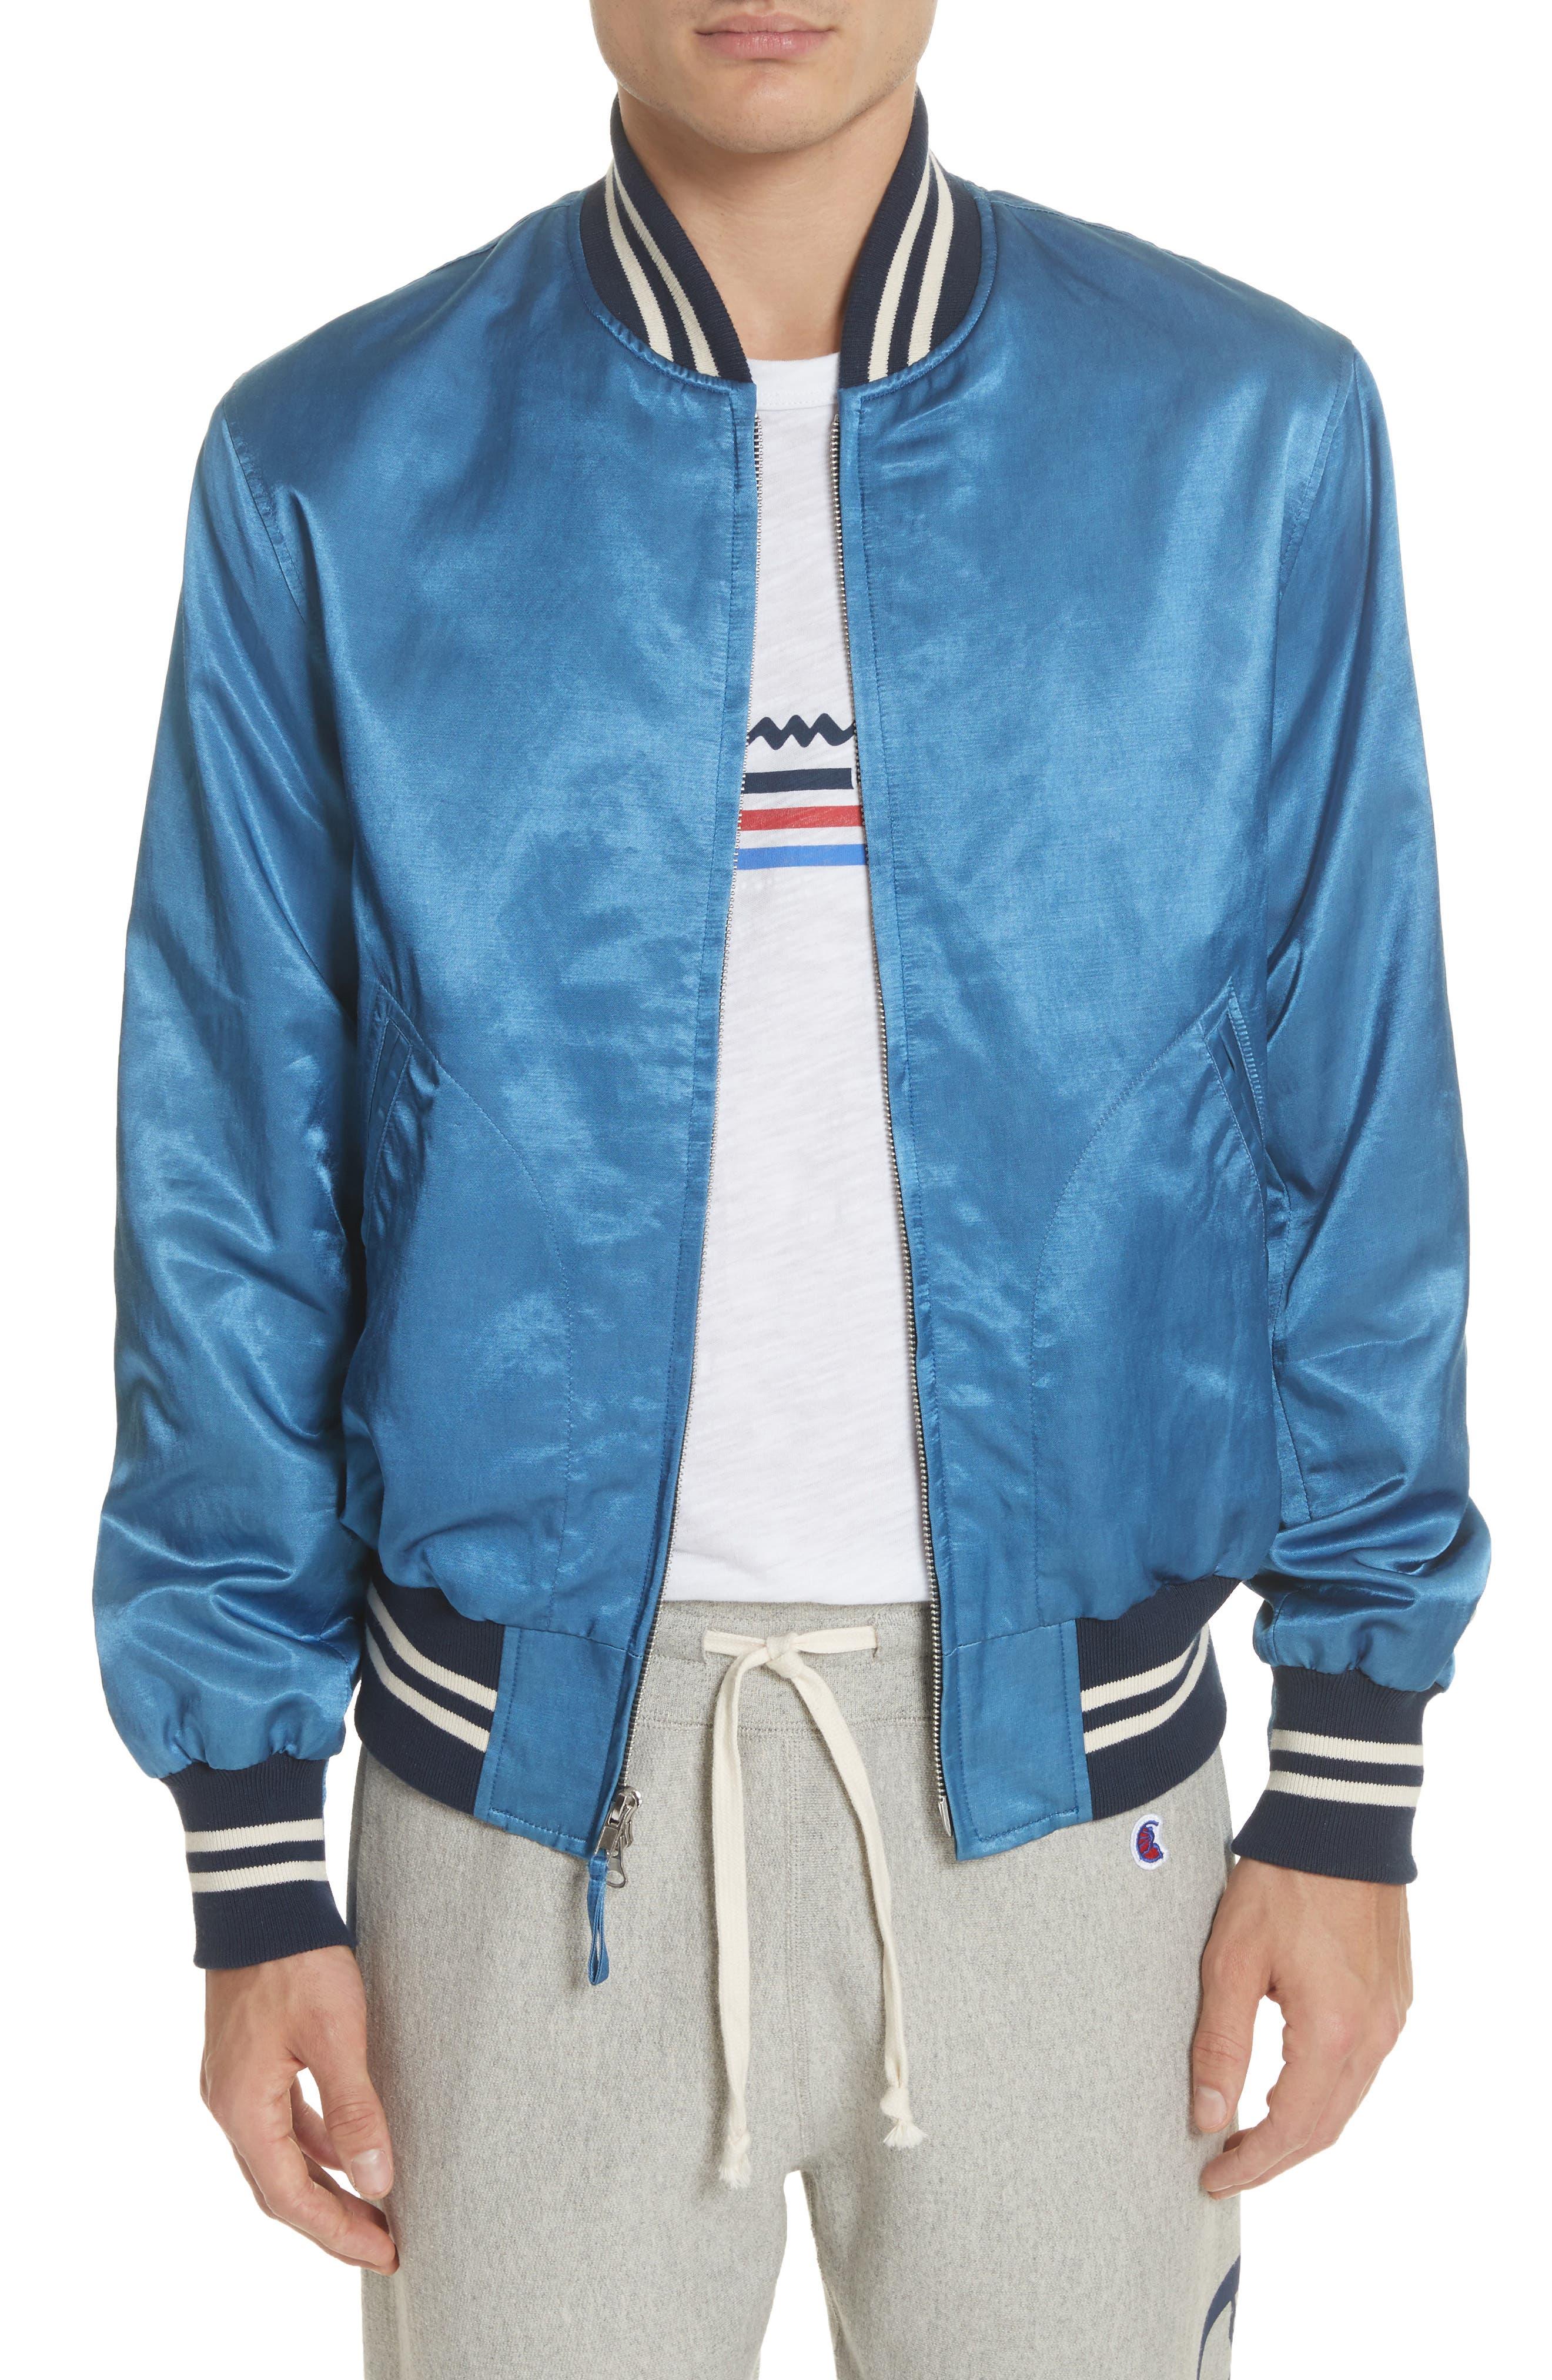 Todd Snyder Bomber Jacket